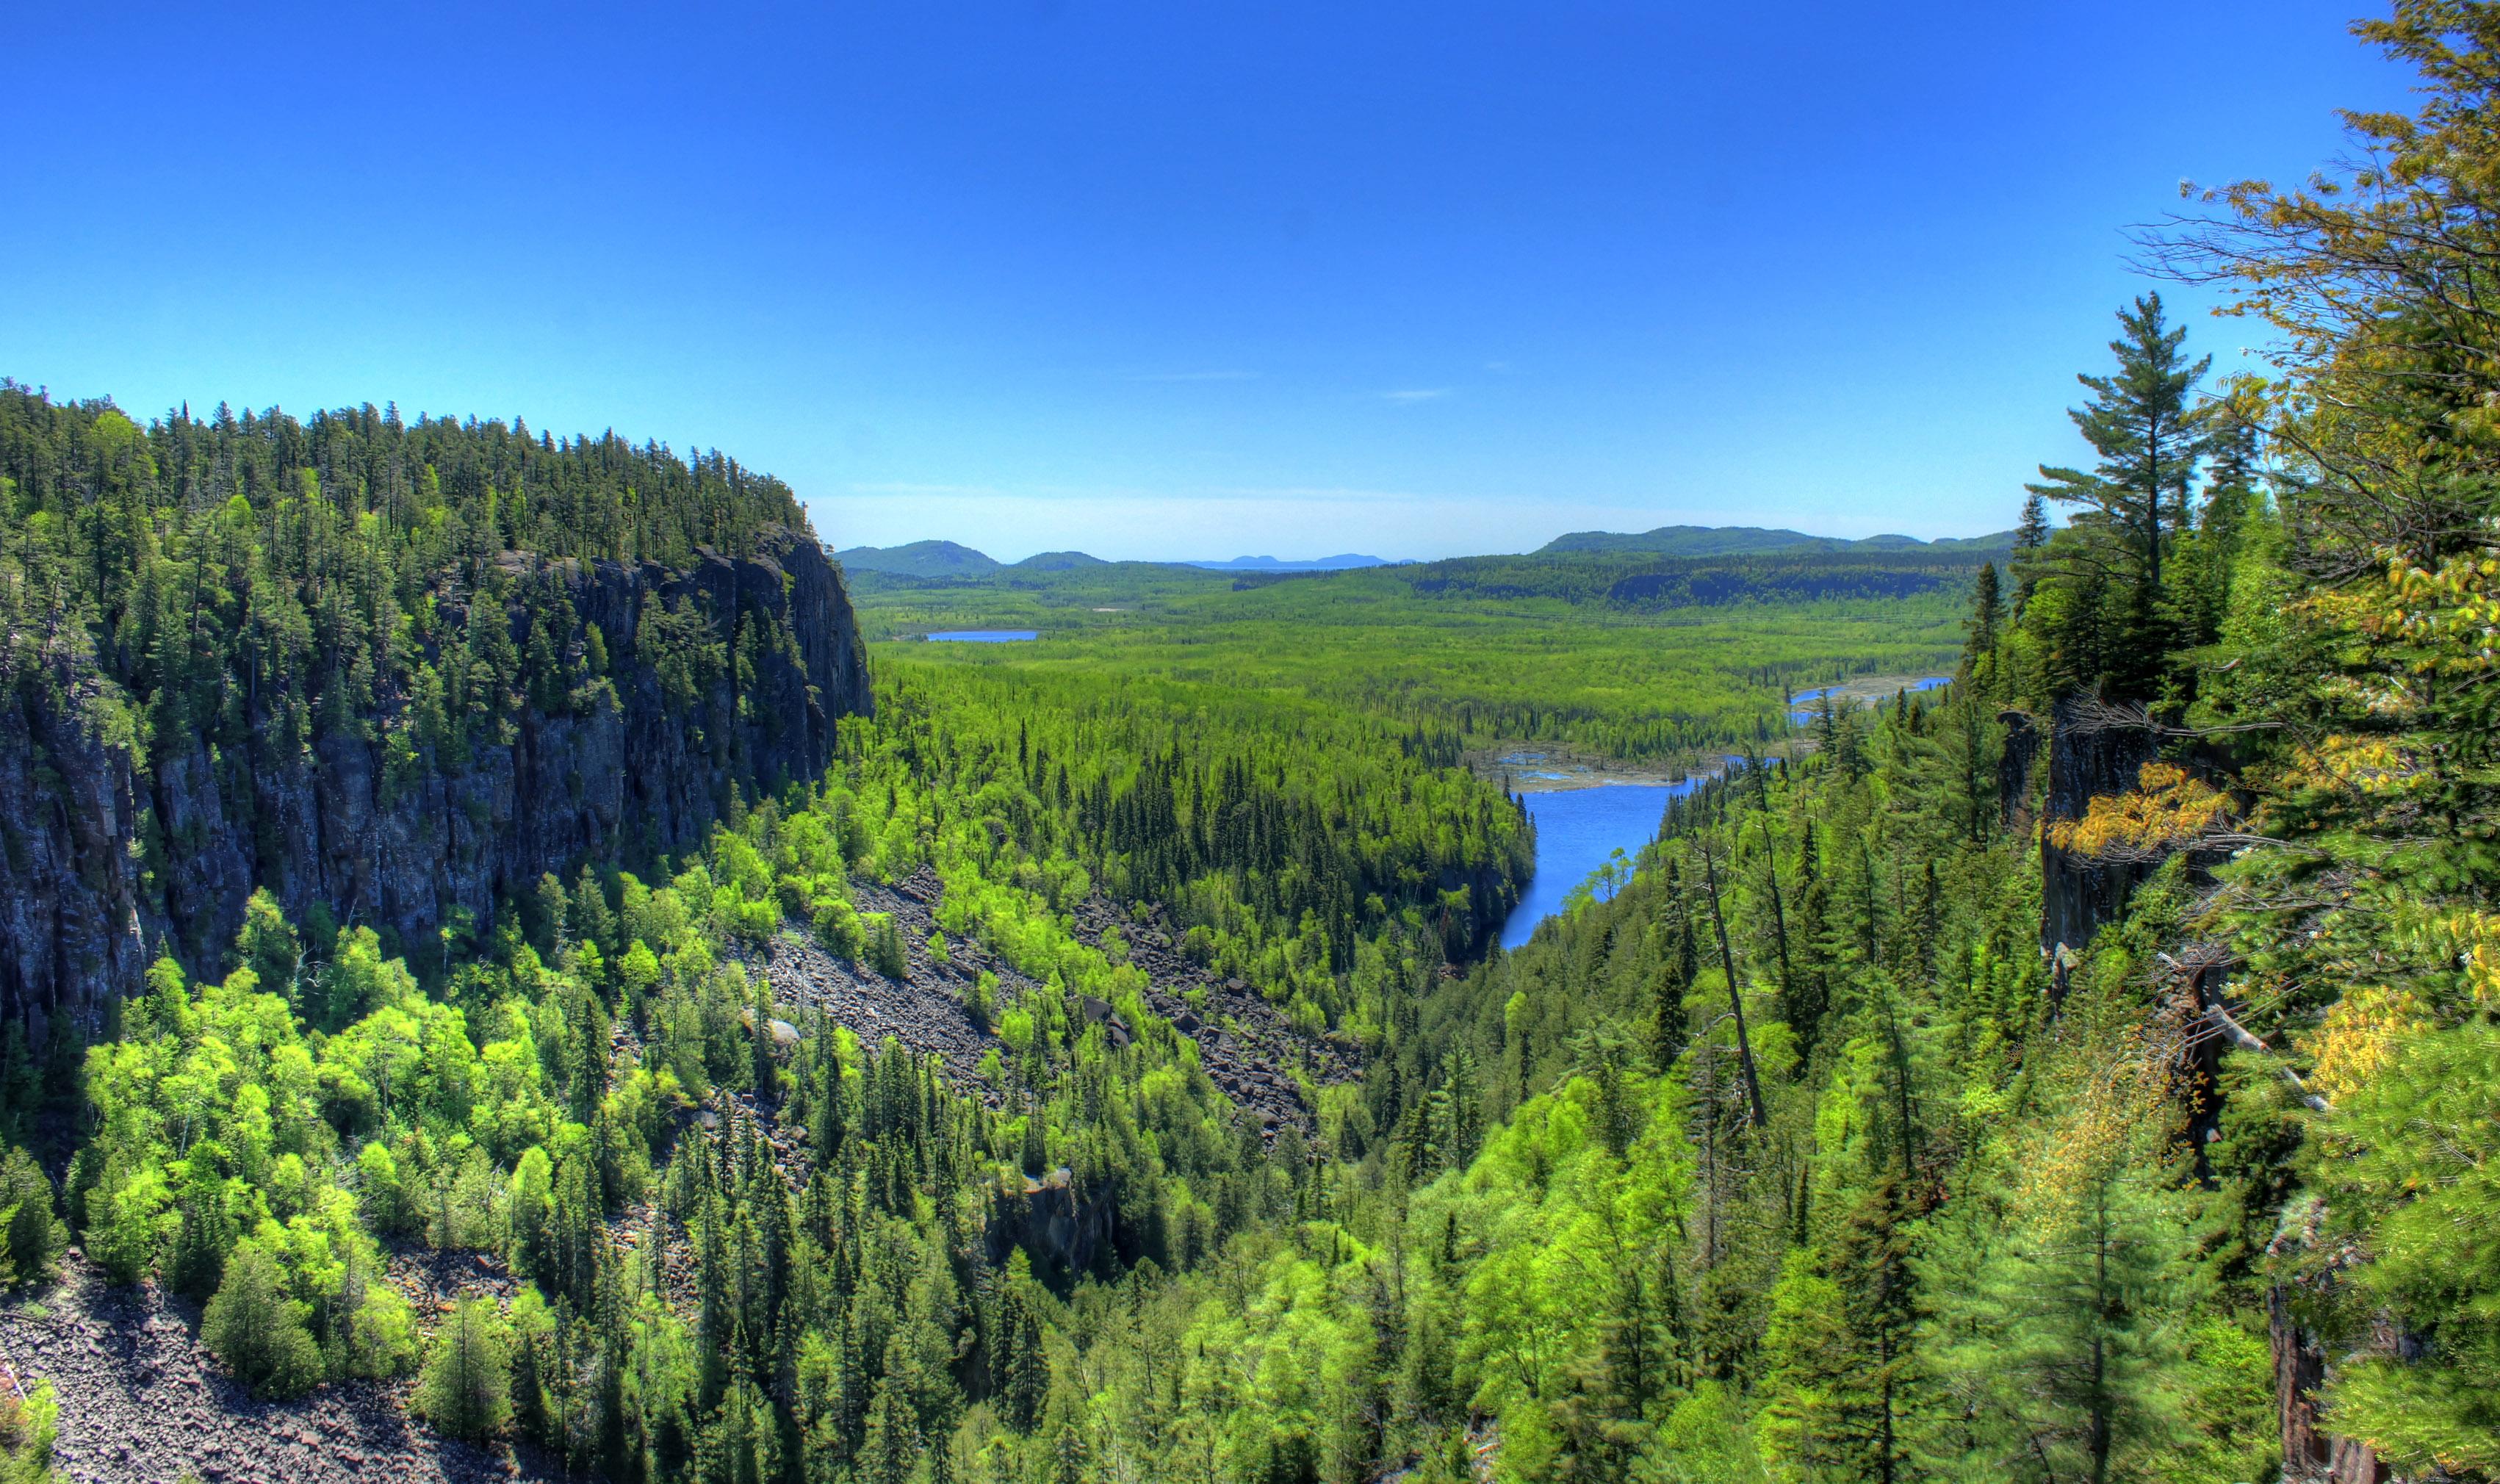 Atnarko River, Tweedsmuir South Provincial Park, British Columbia